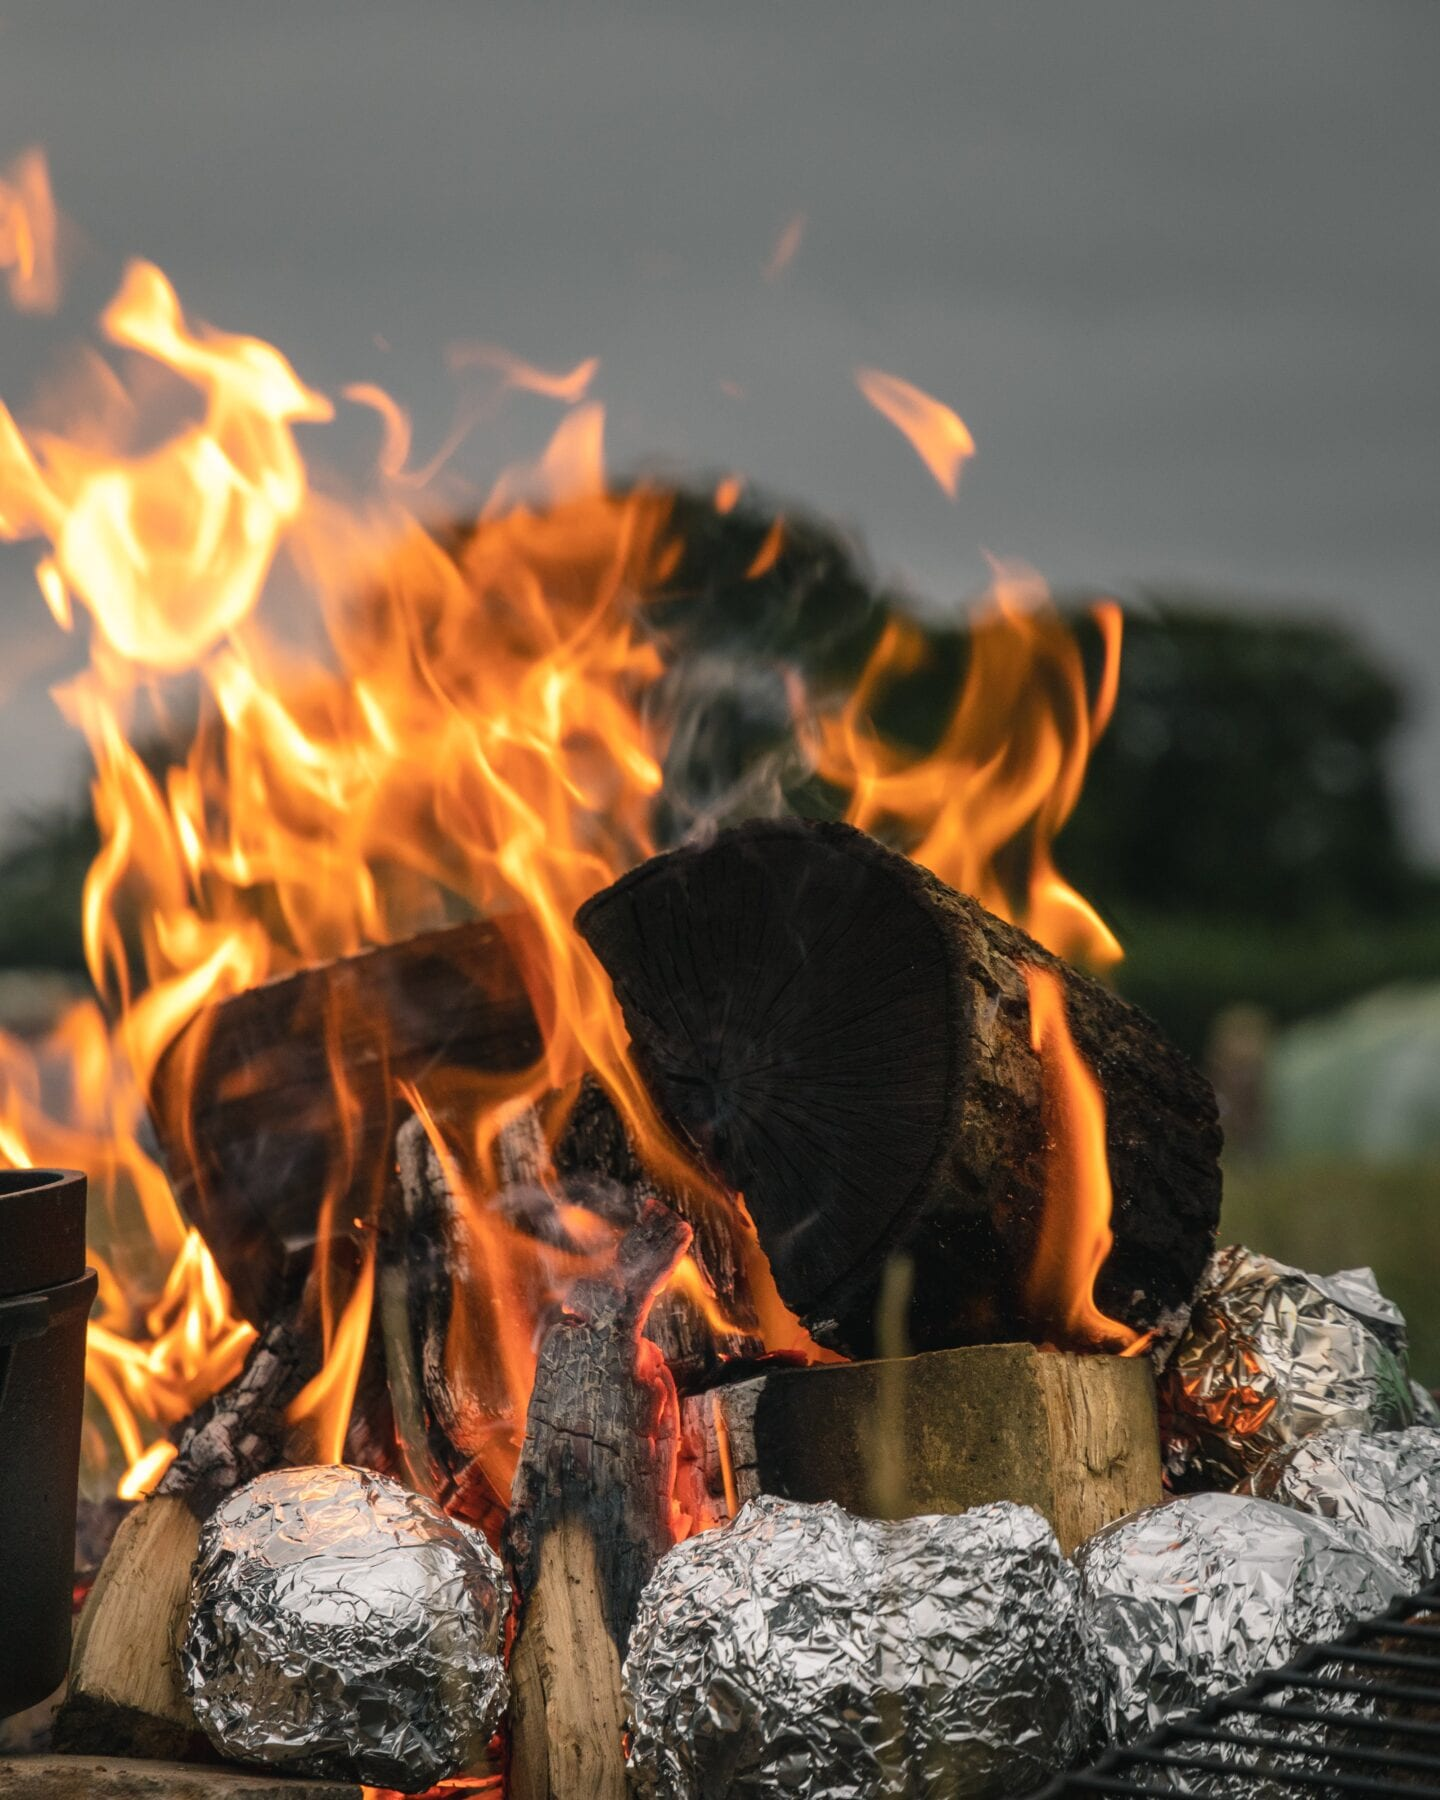 Koken op vuur alluminiumfolie